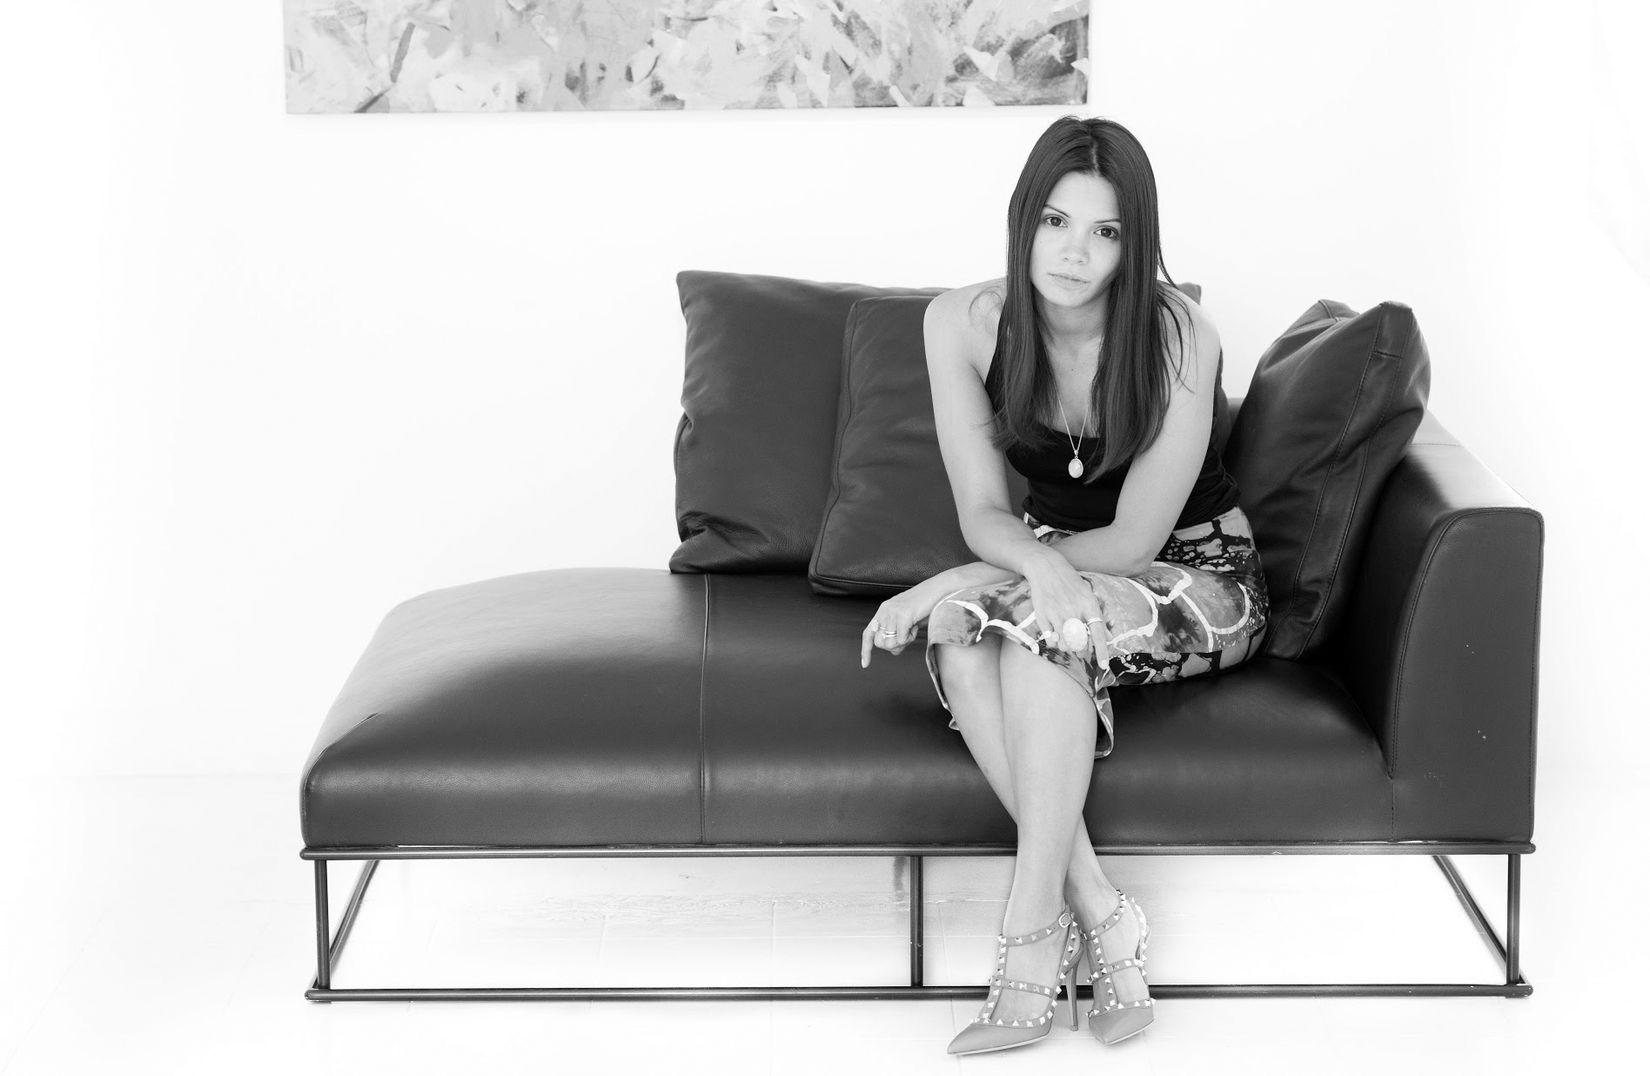 An Interview With Saskia Fernando of Saskia Fernando Gallery